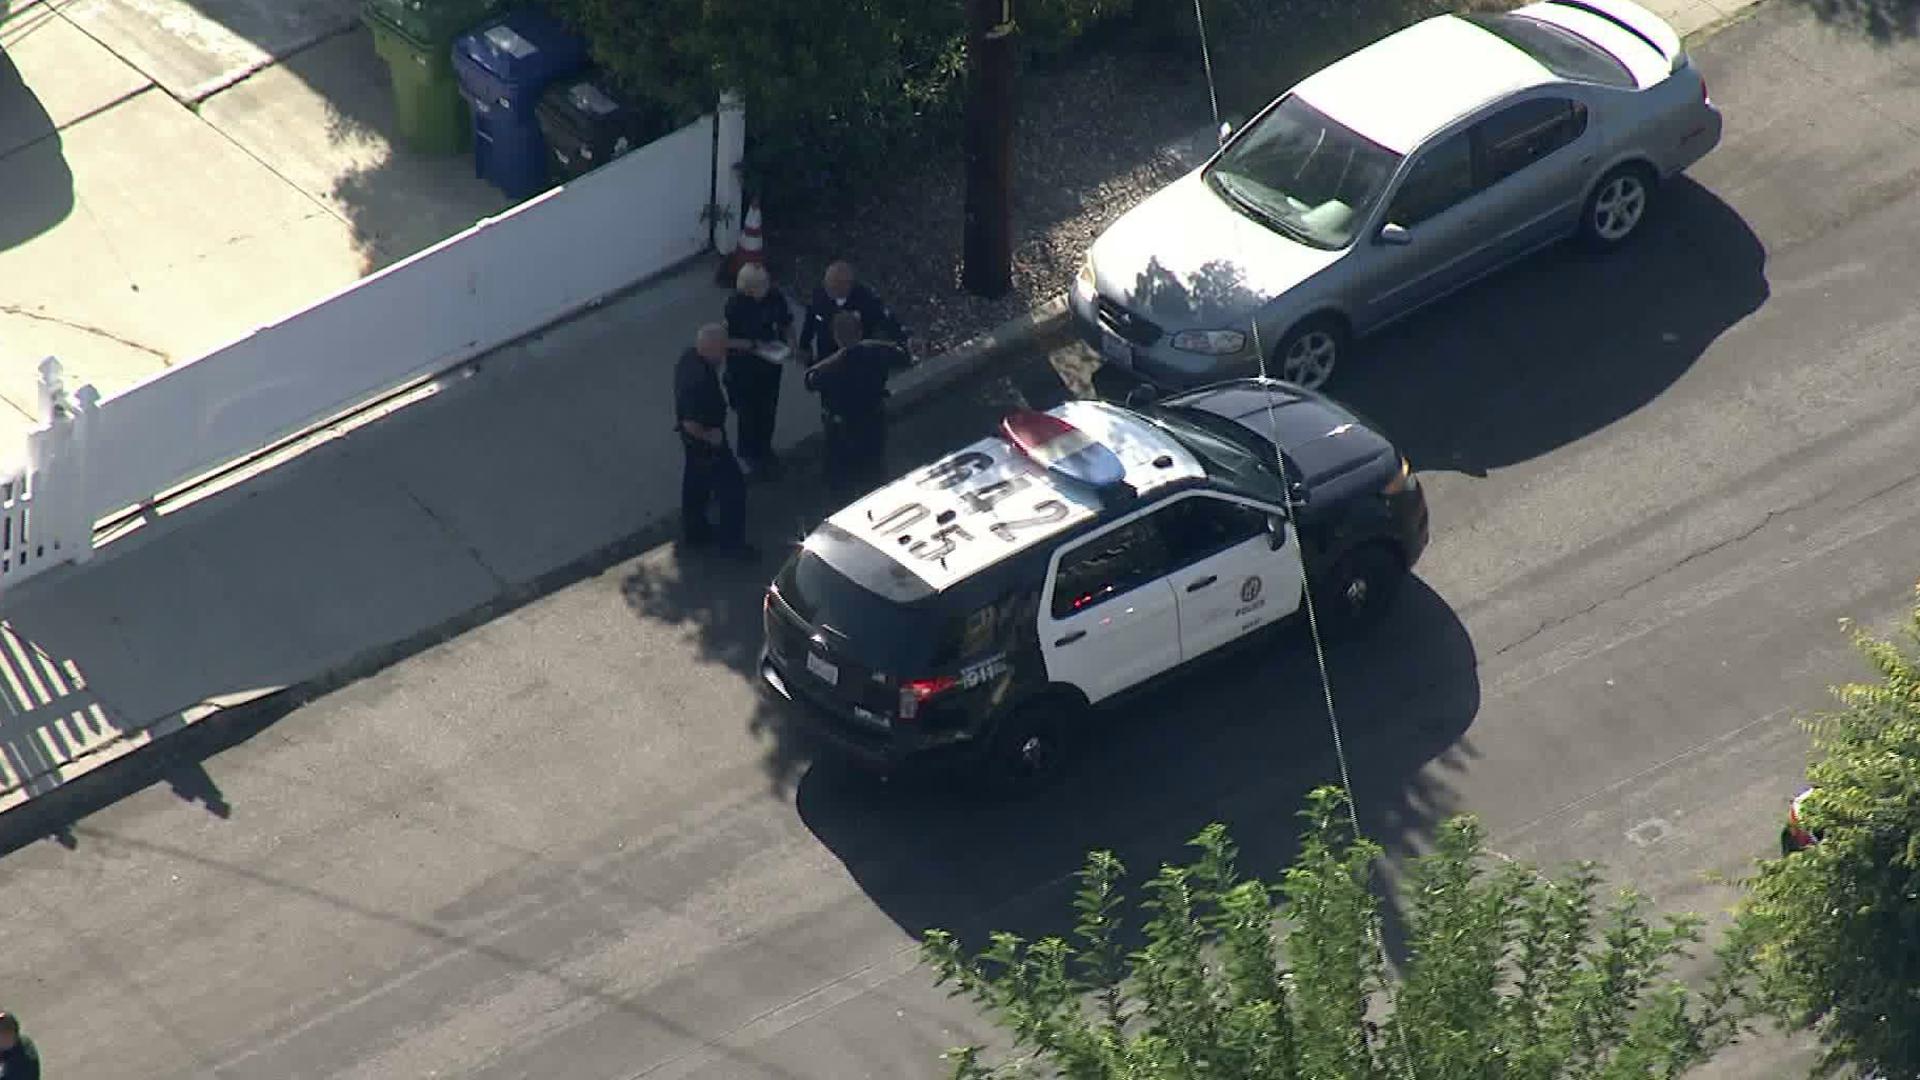 Police investigate a fatal shooting in San Pedro on September 19, 2019. (Credit: KTLA)